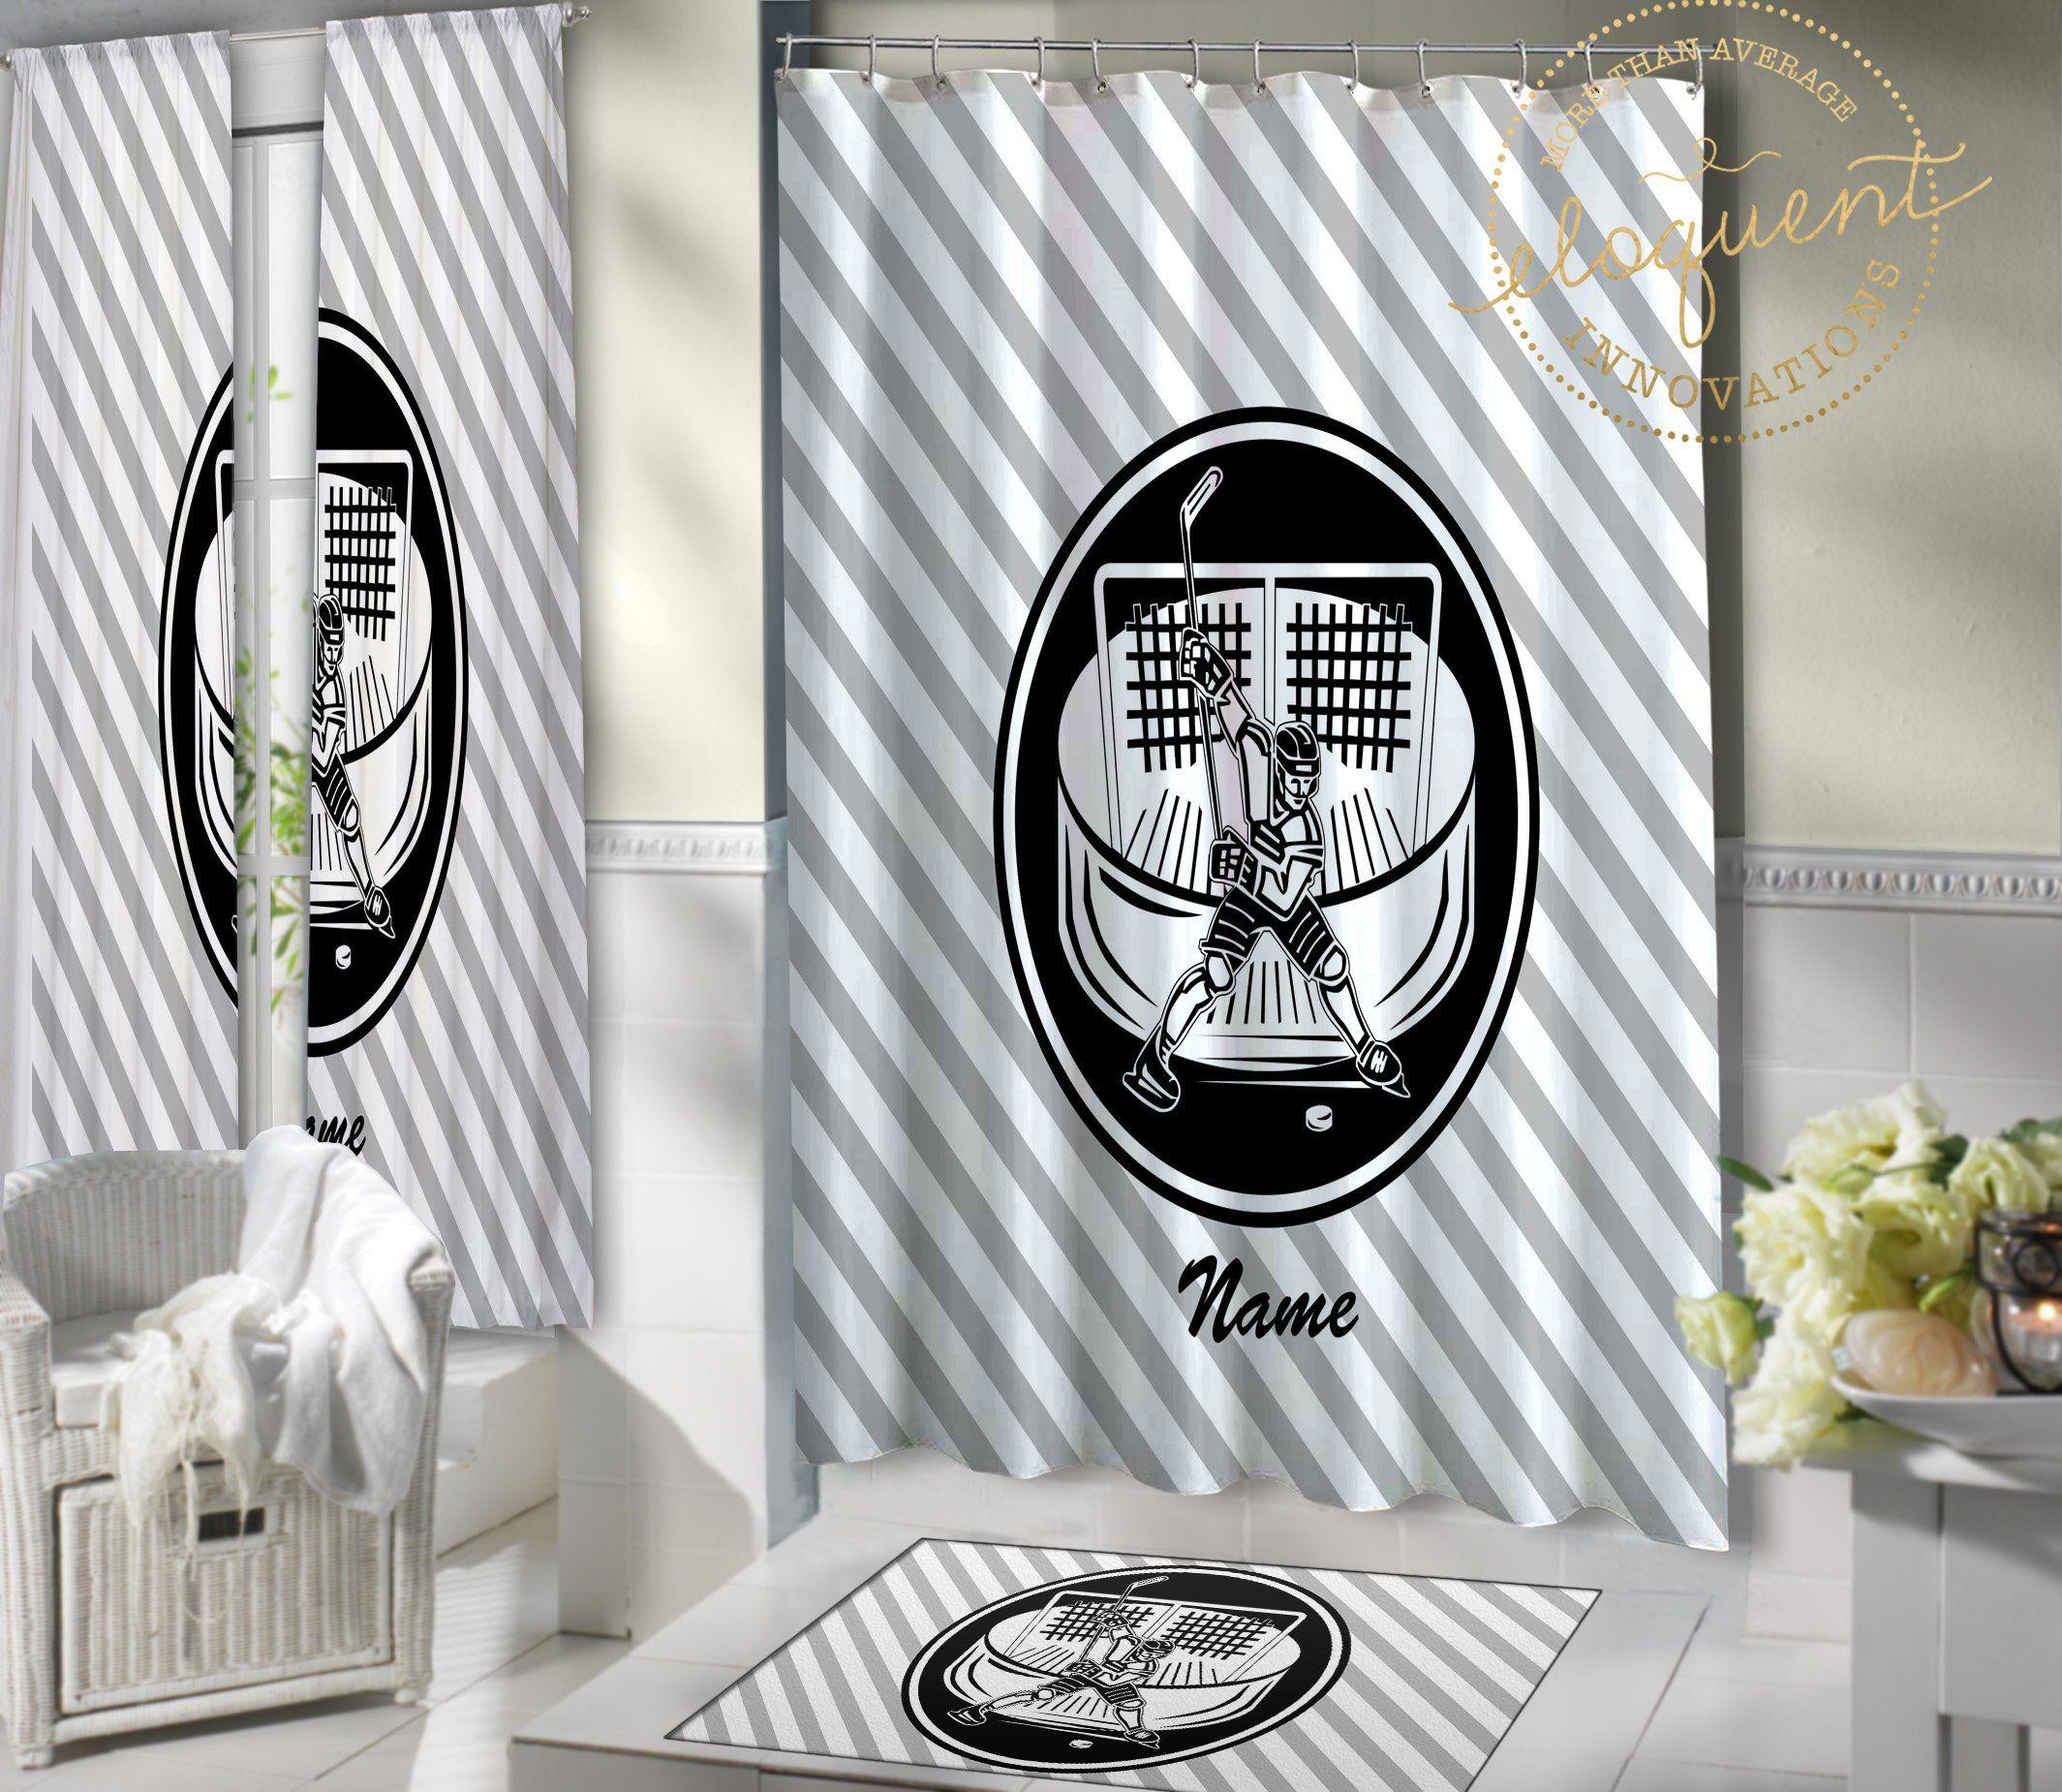 Hockey Shower Curtain Fabric Sports Themed Bathroom